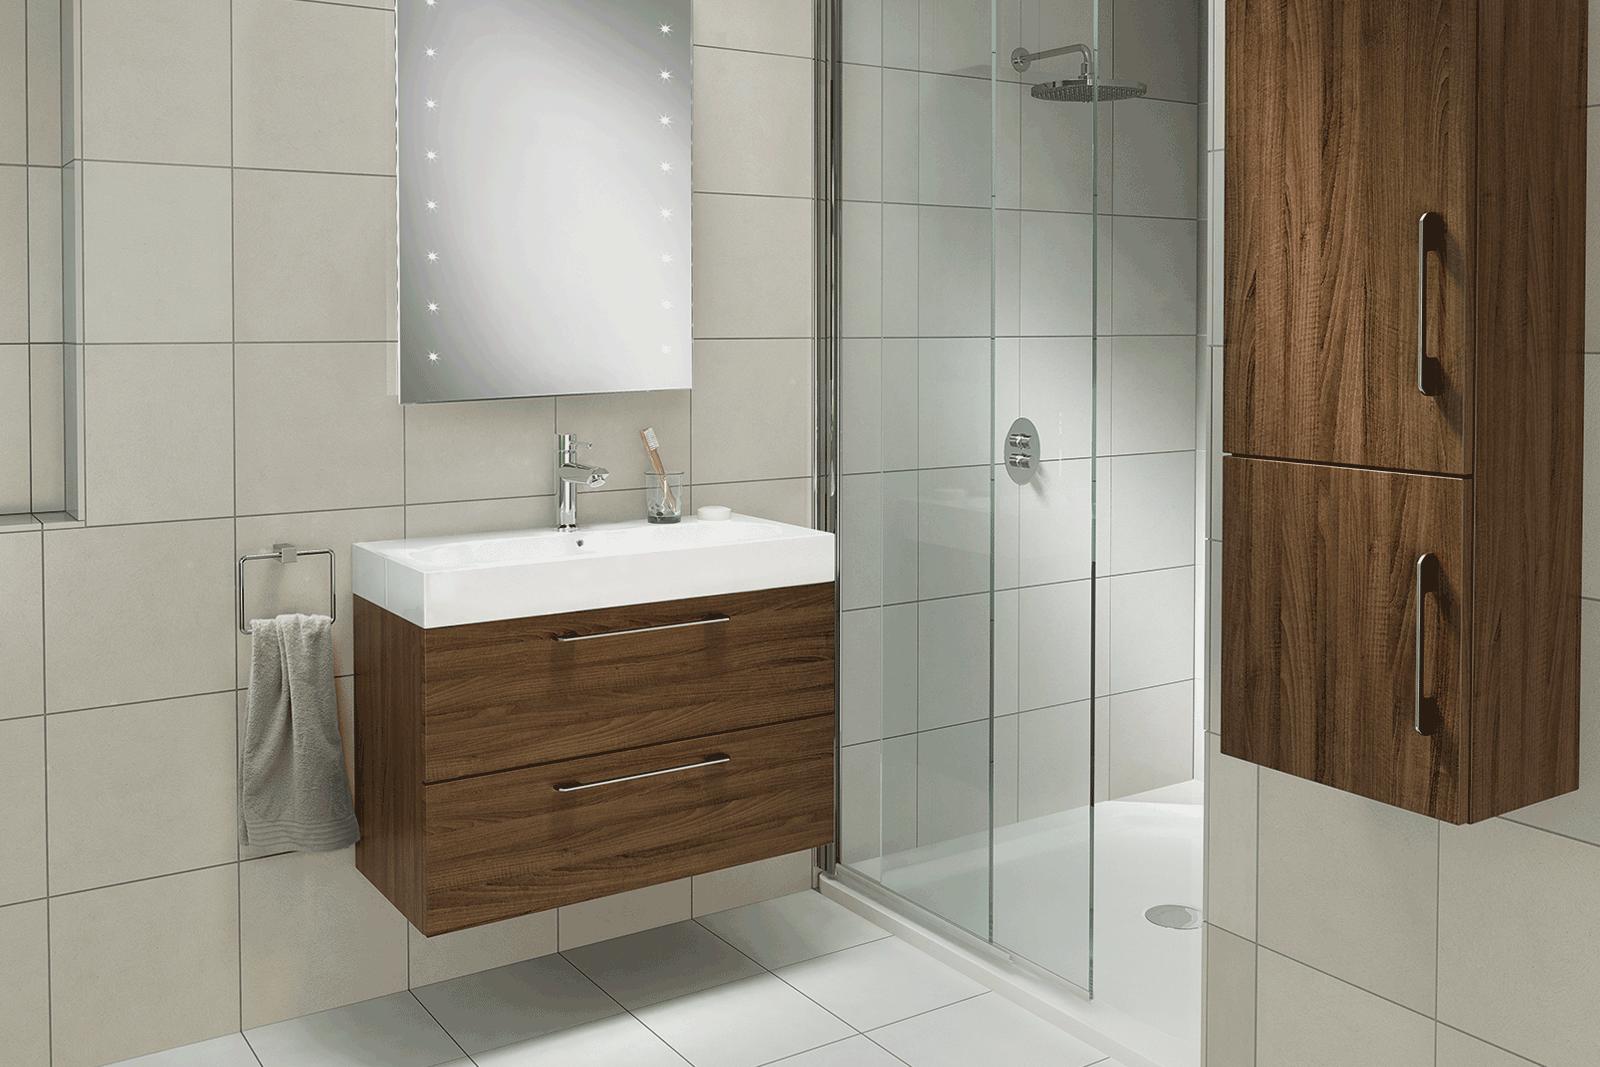 Bathline Bathroom Wetroom Design Bathrooms Northern